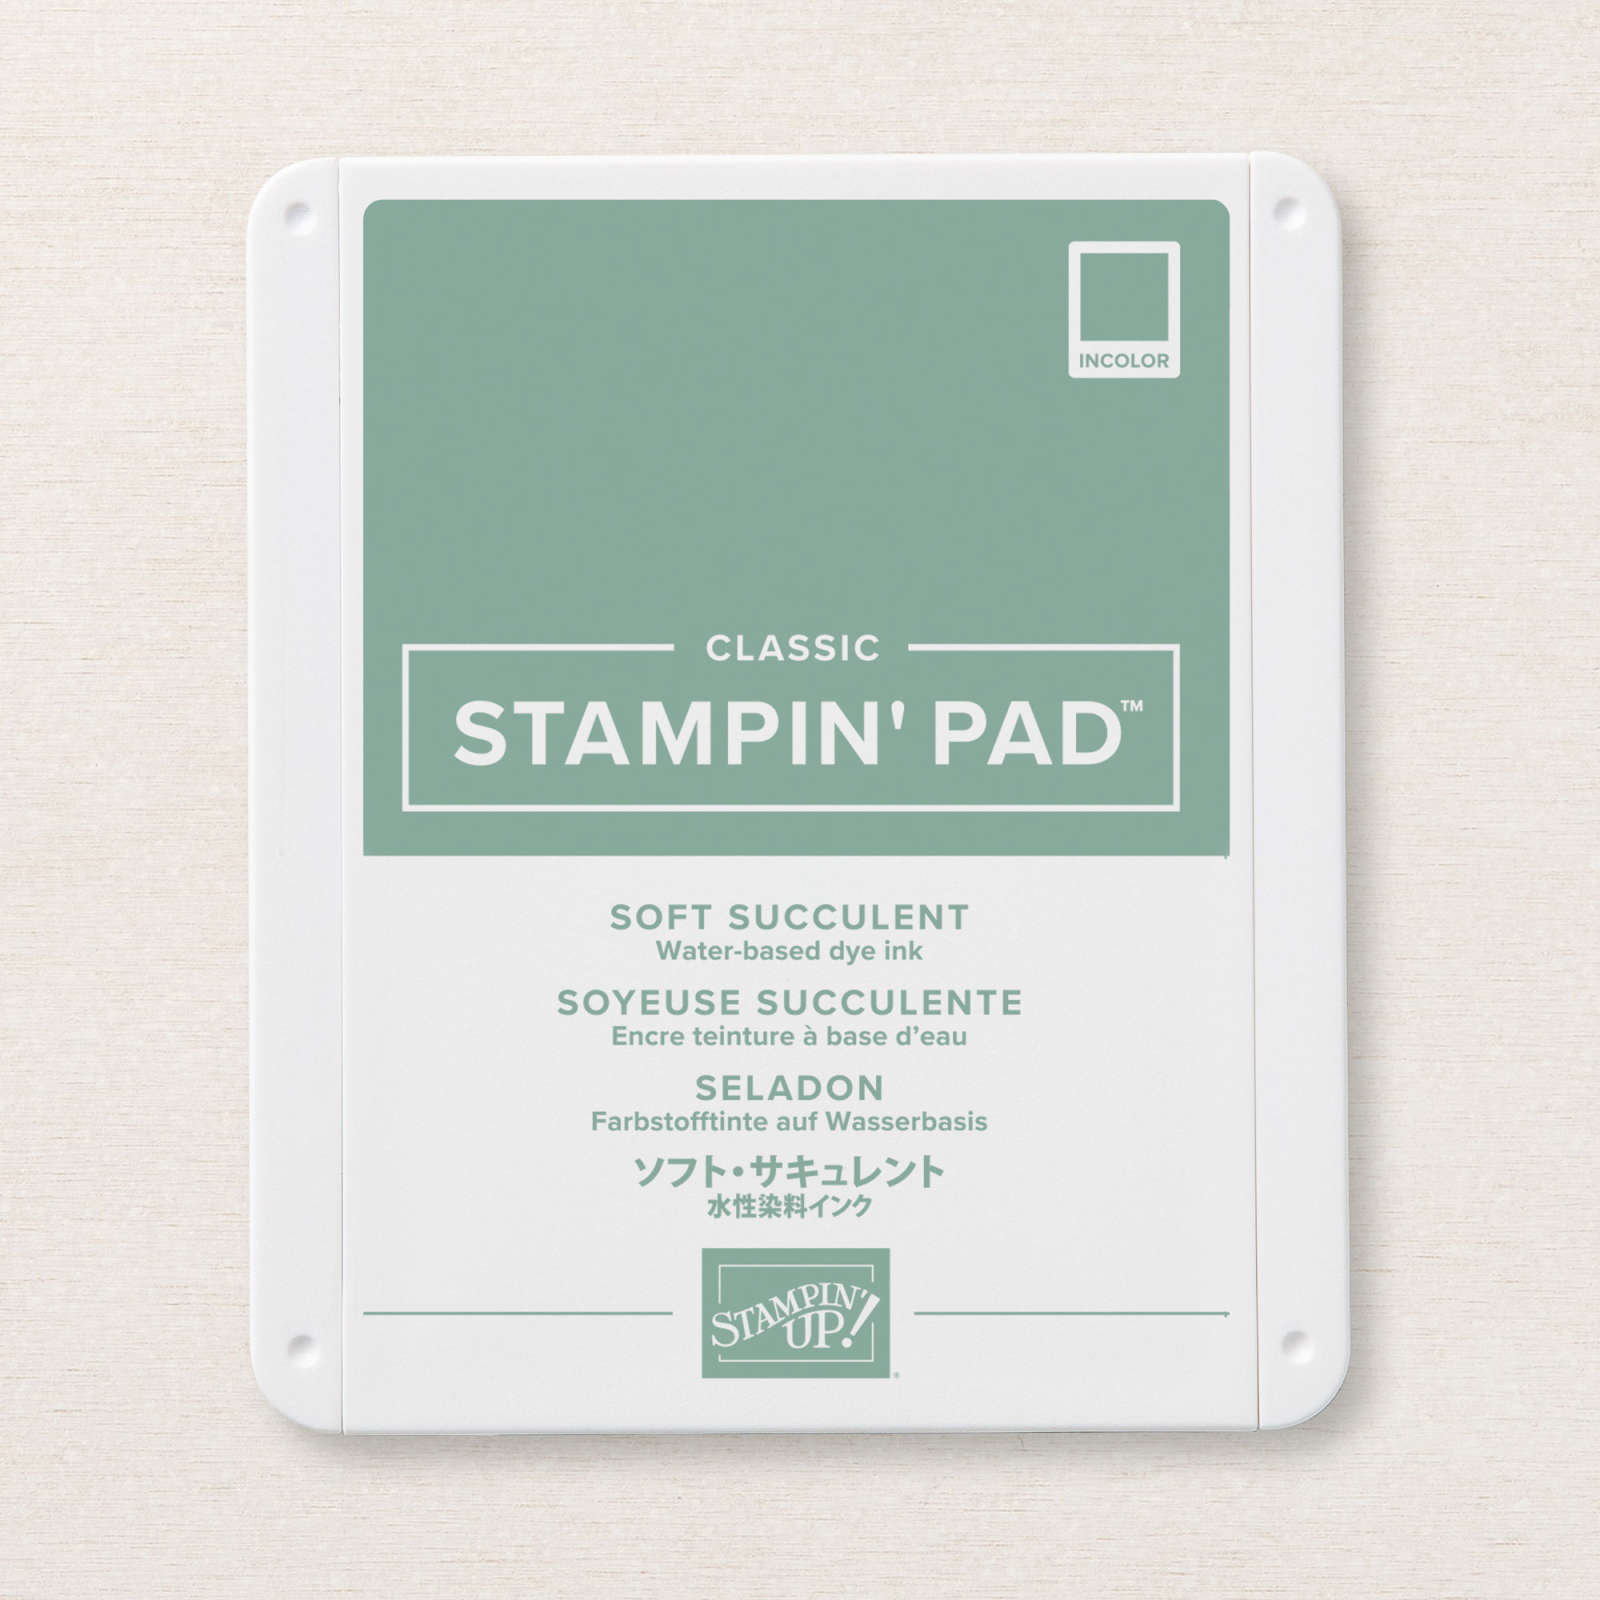 Soft Succulent Classic Stampin' Pad